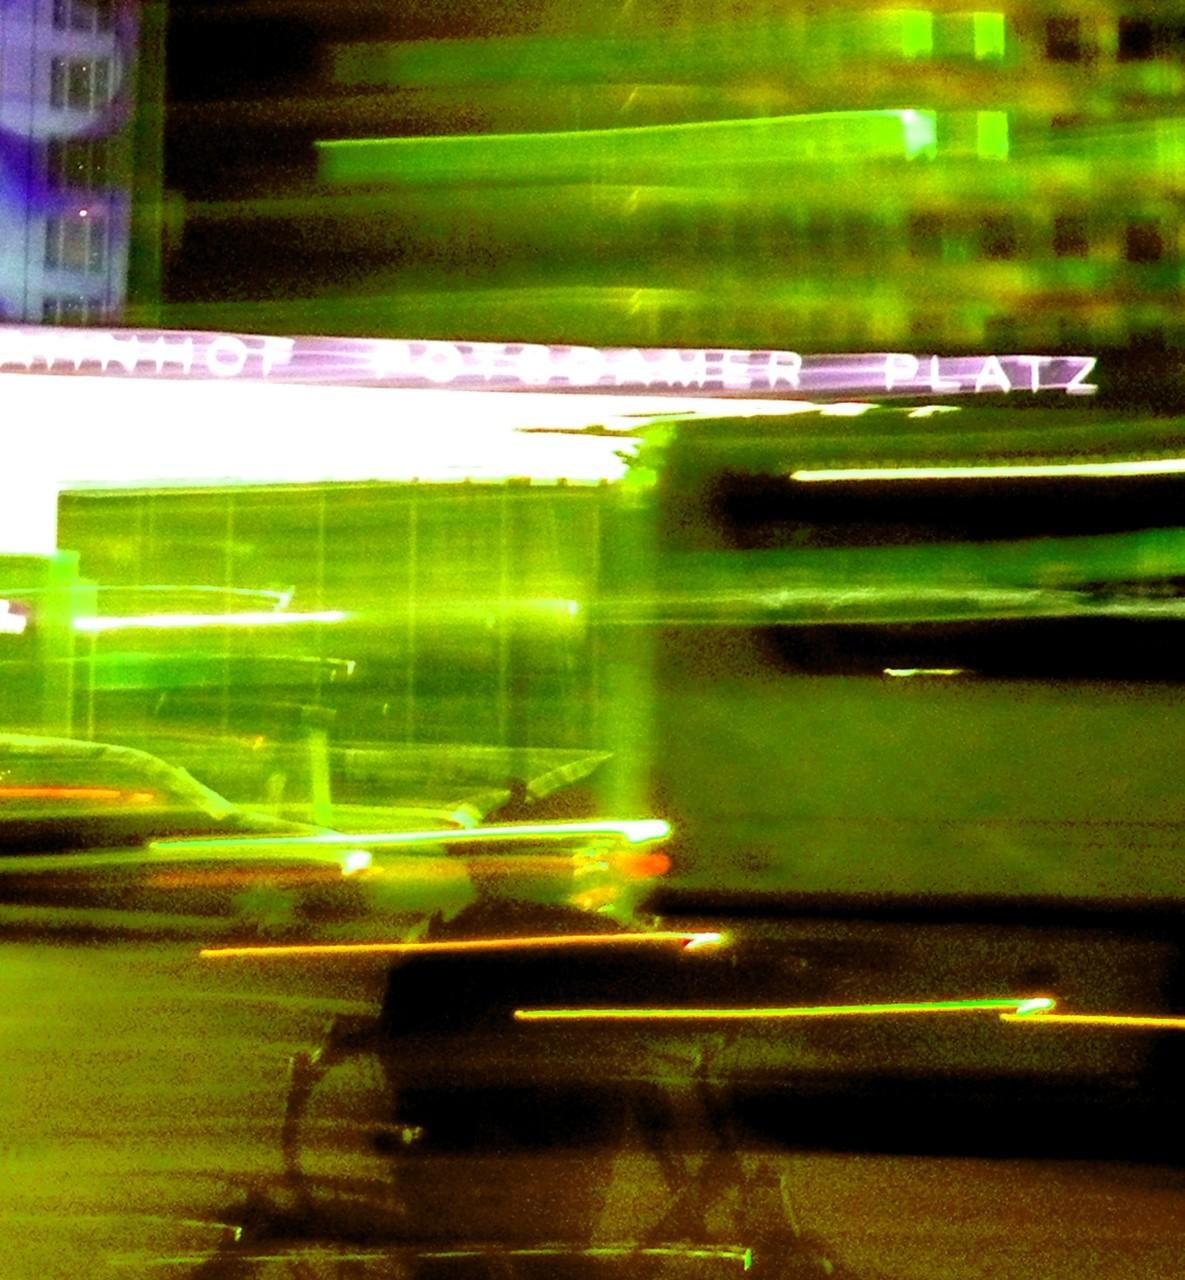 moving lights 7, 2010